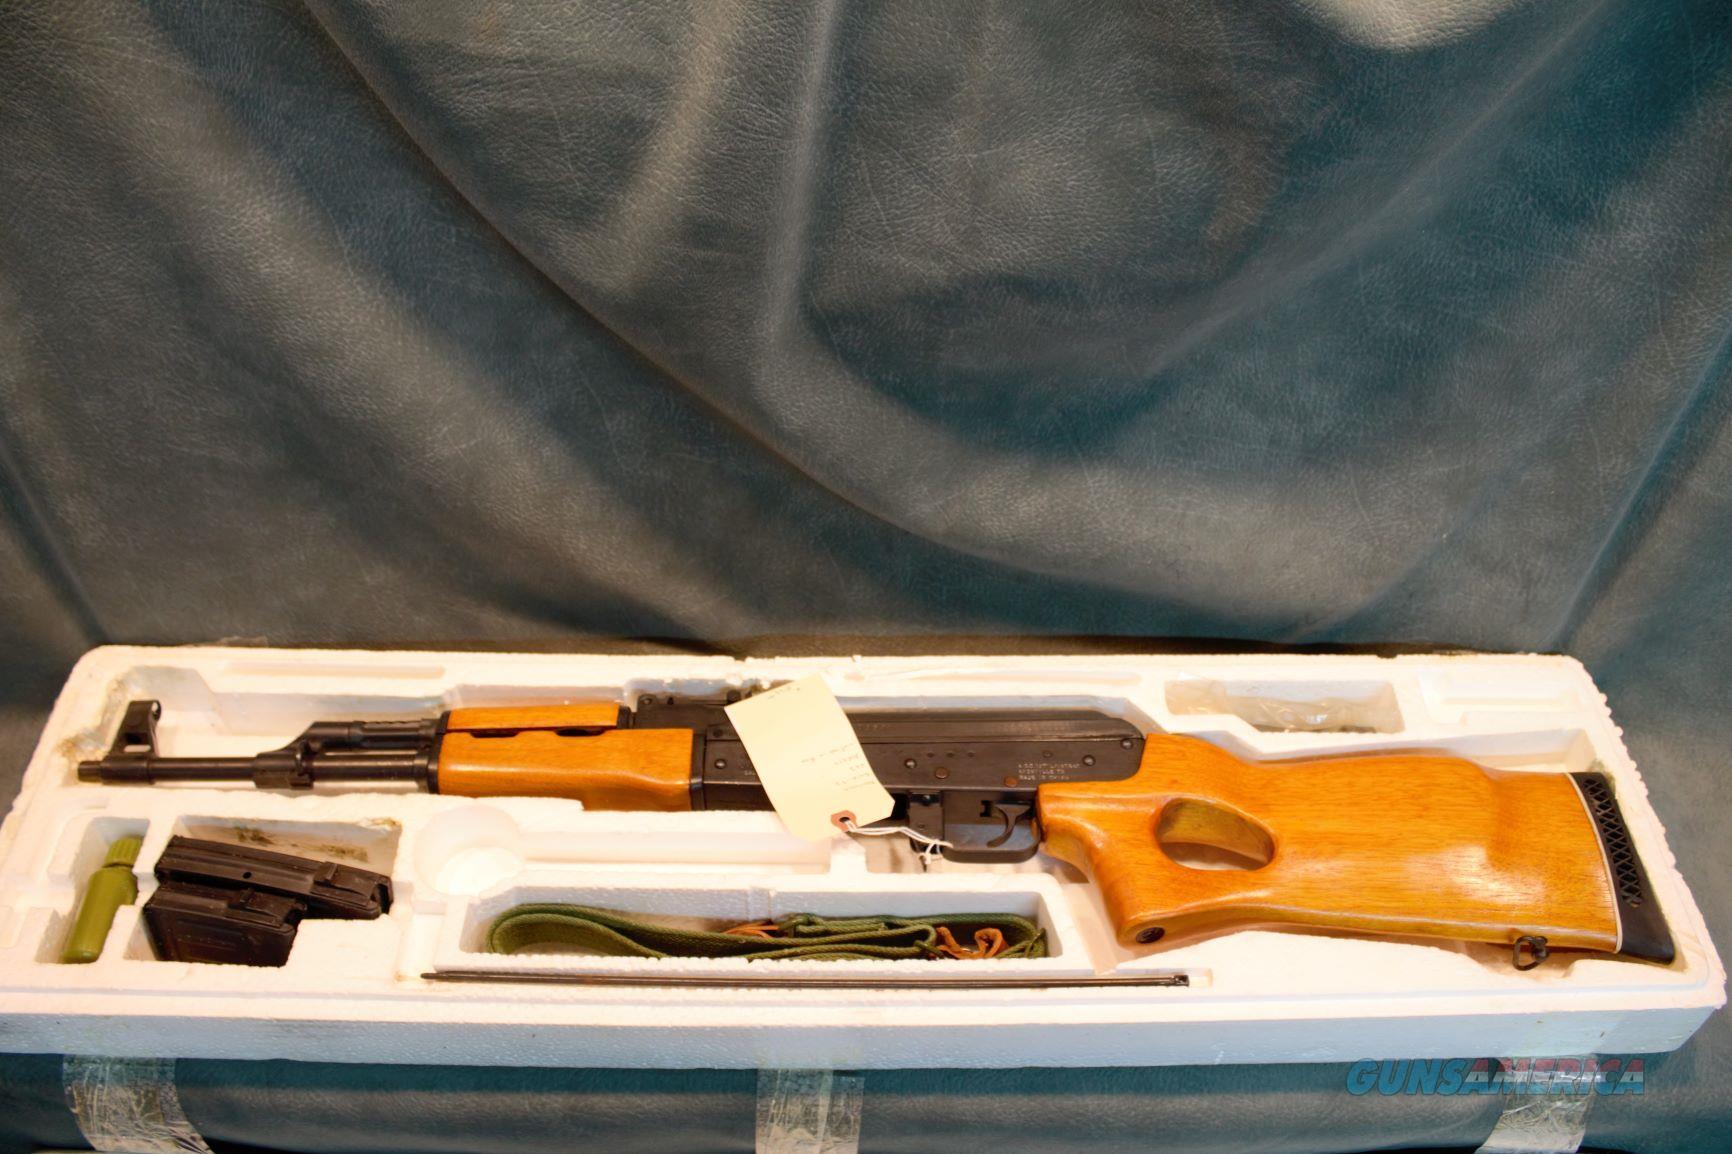 Norinco BWK-92 223 unfired  Guns > Rifles > Norinco Rifles